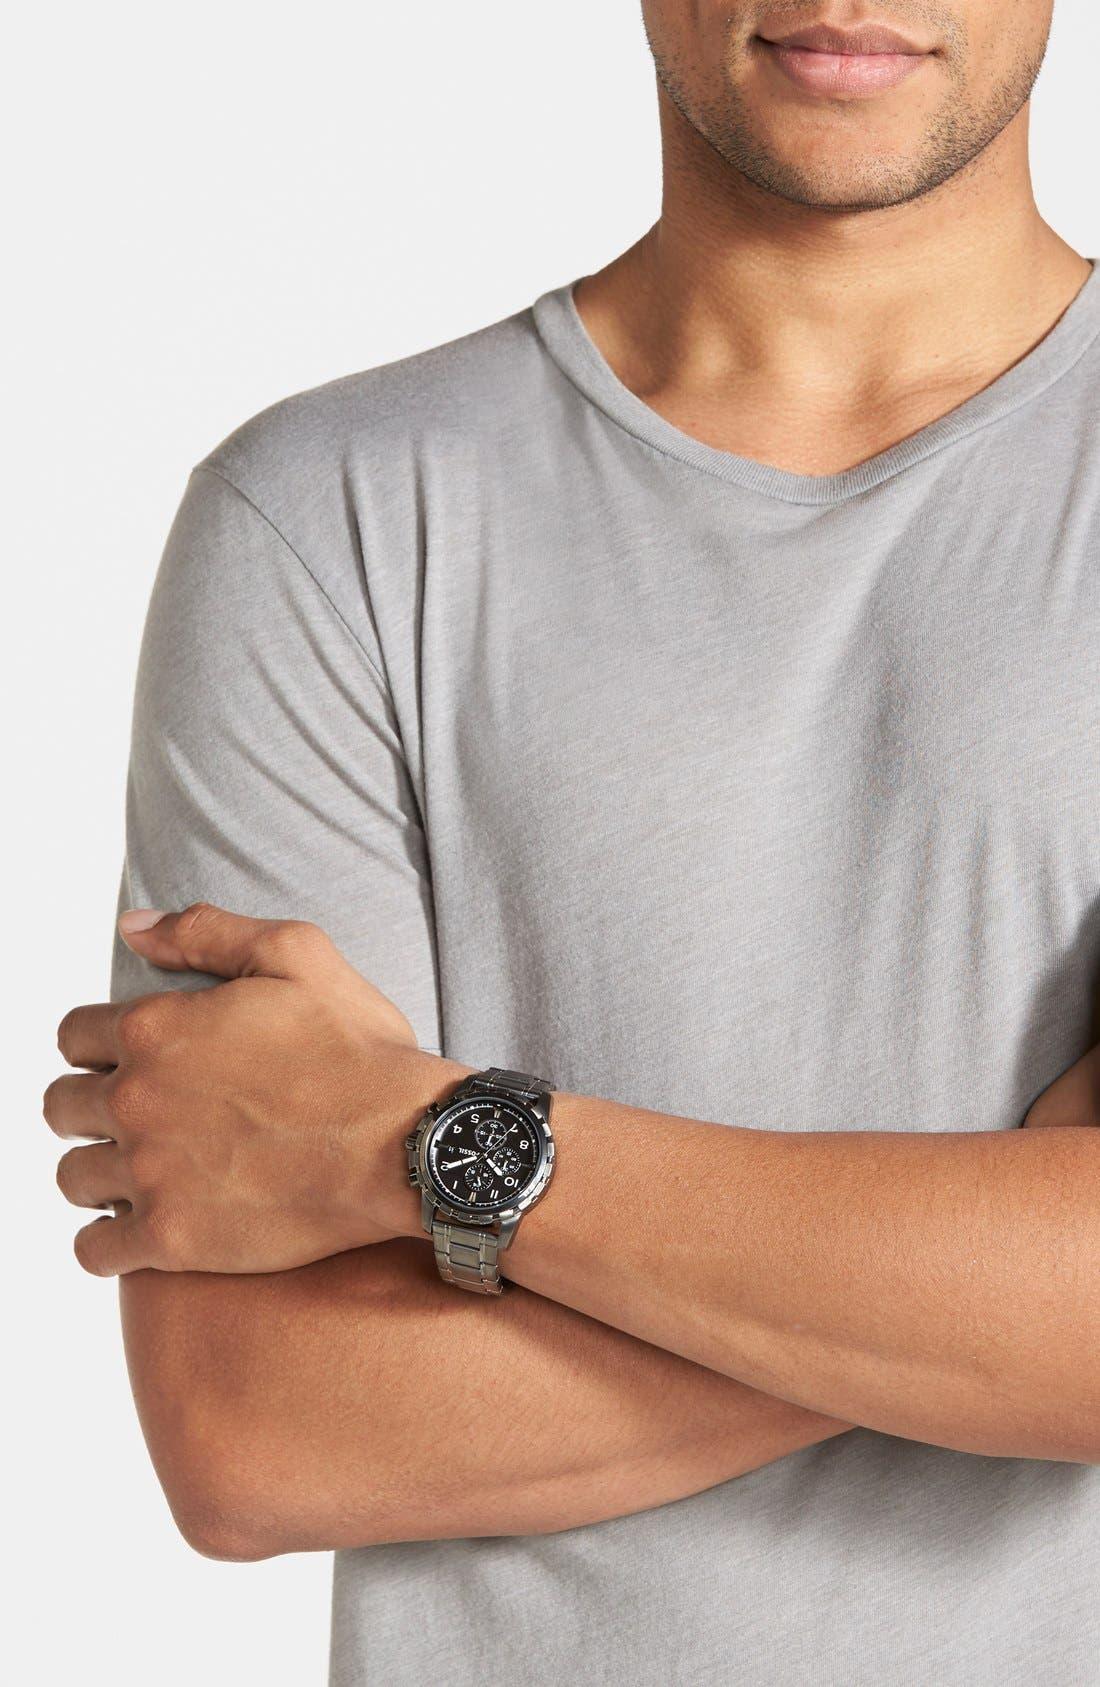 Notched Bezel Chronograph Bracelet Watch, 45mm,                             Alternate thumbnail 4, color,